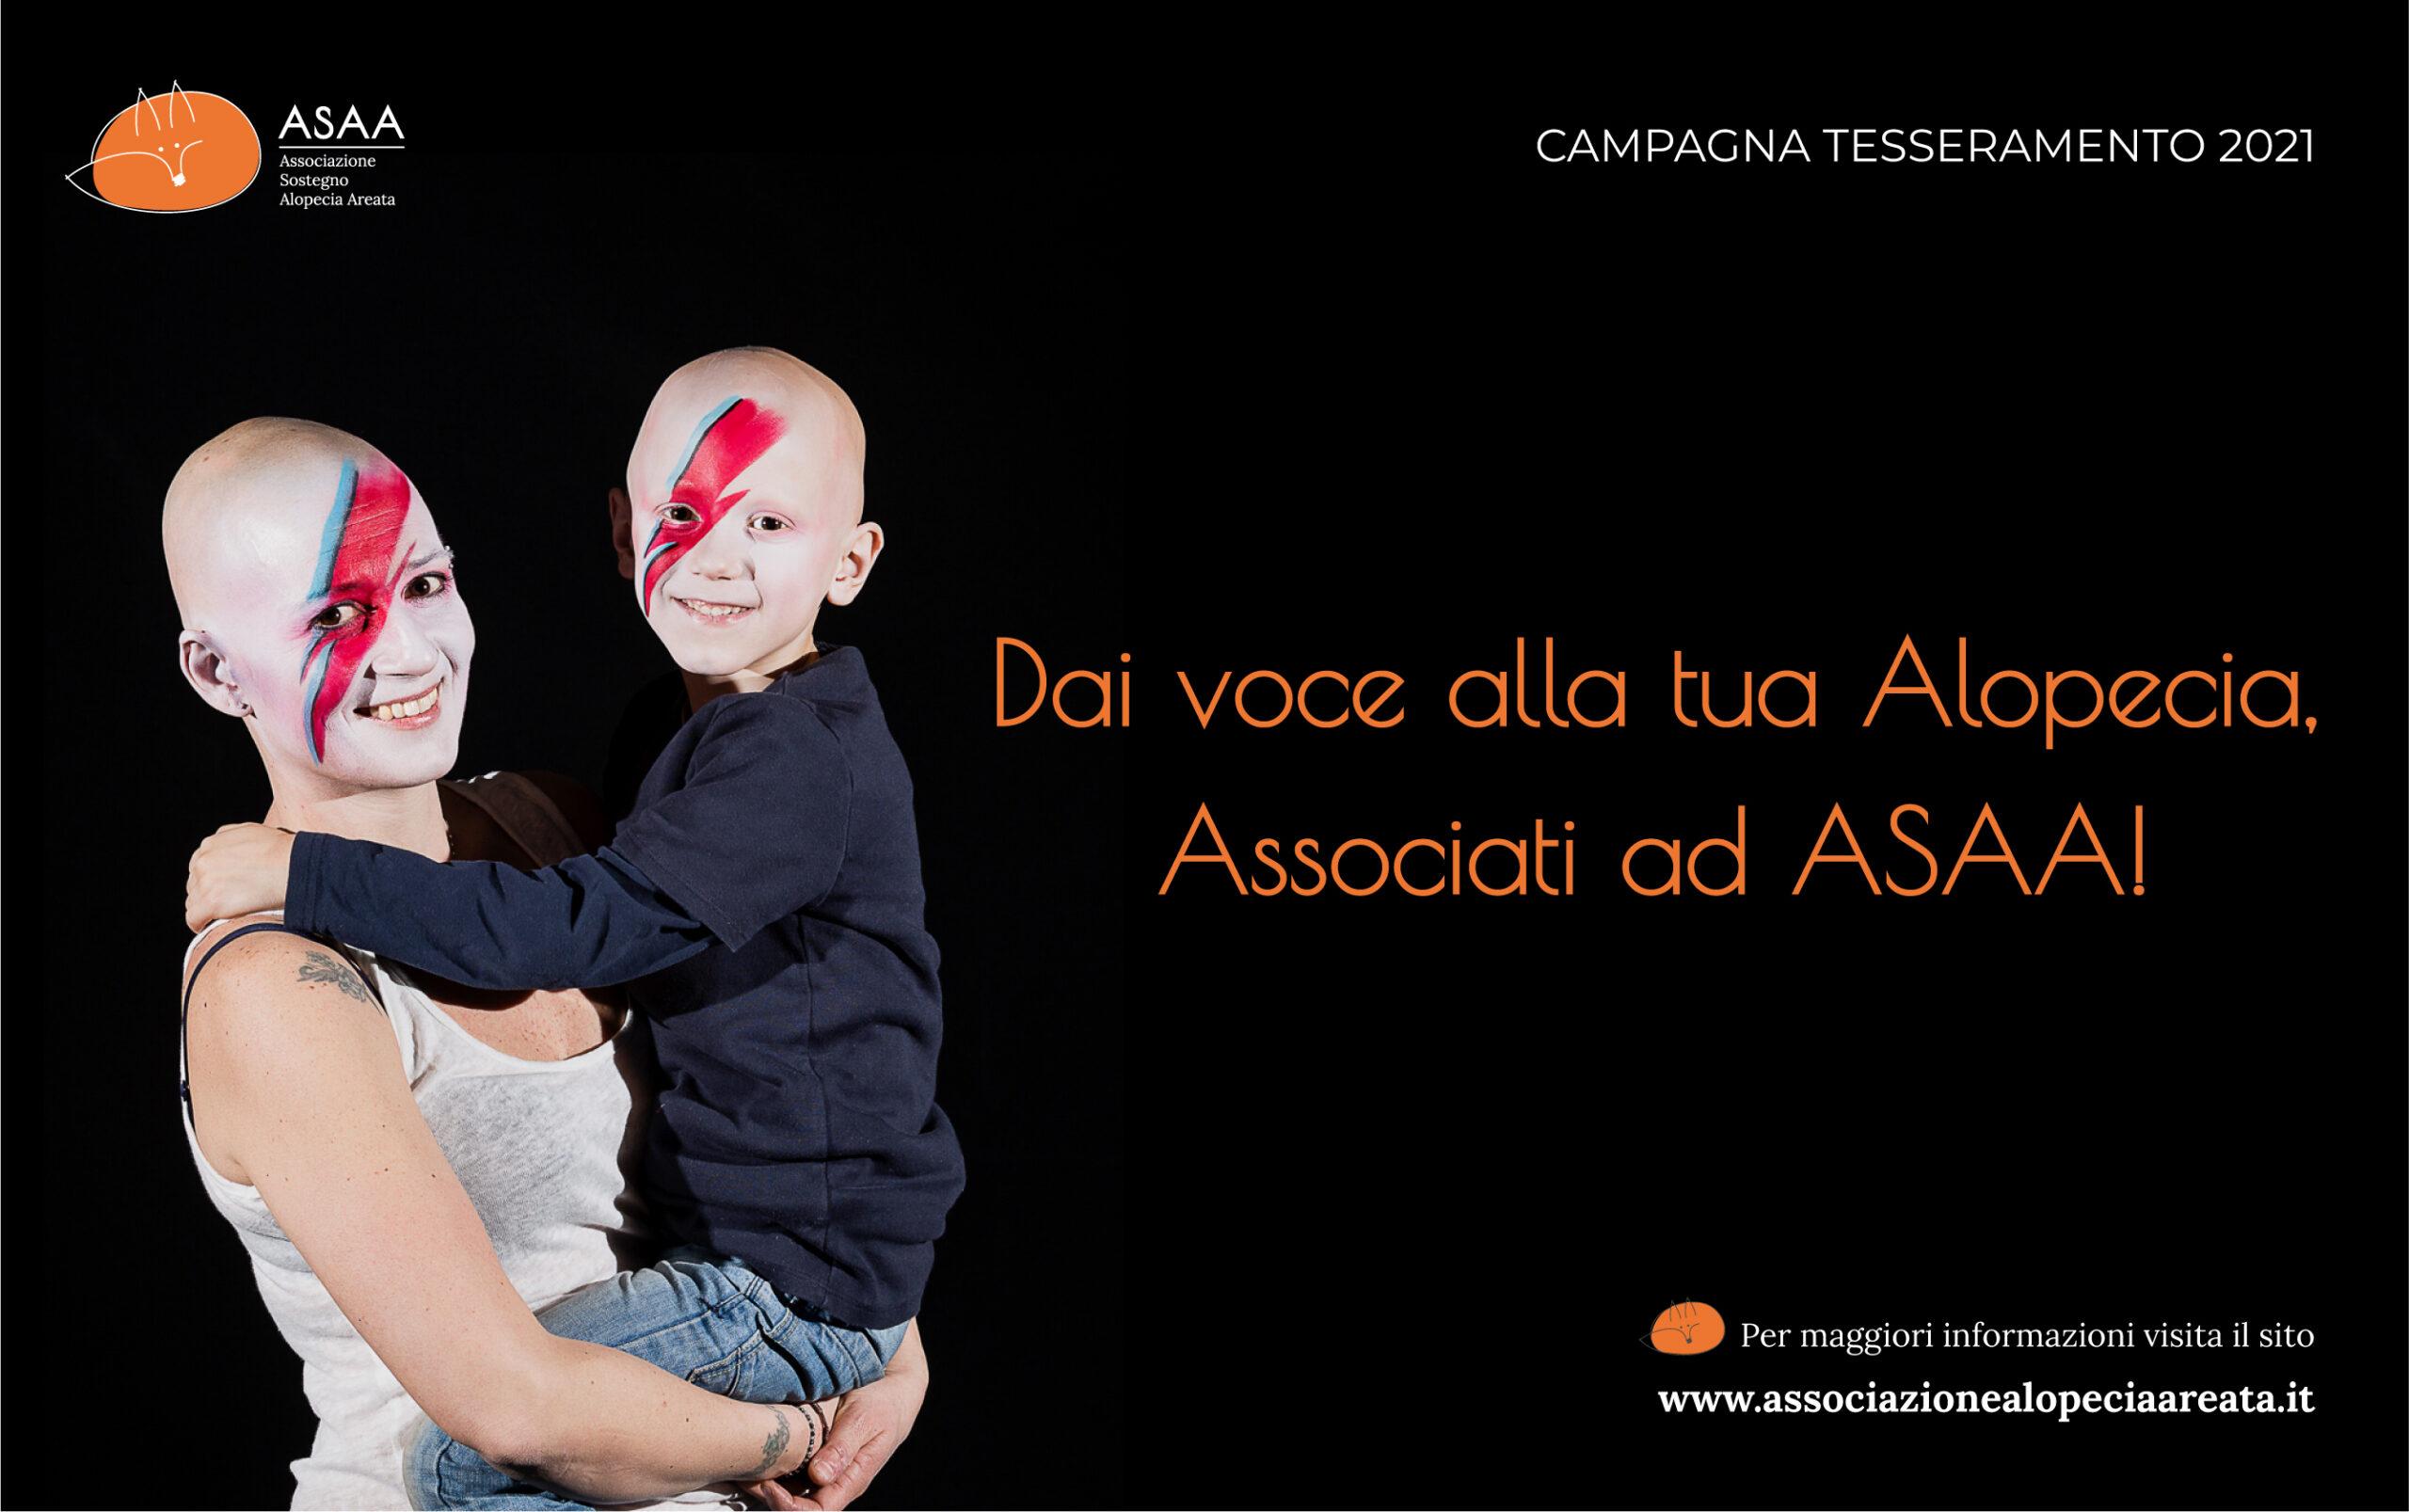 Associati ad ASAA